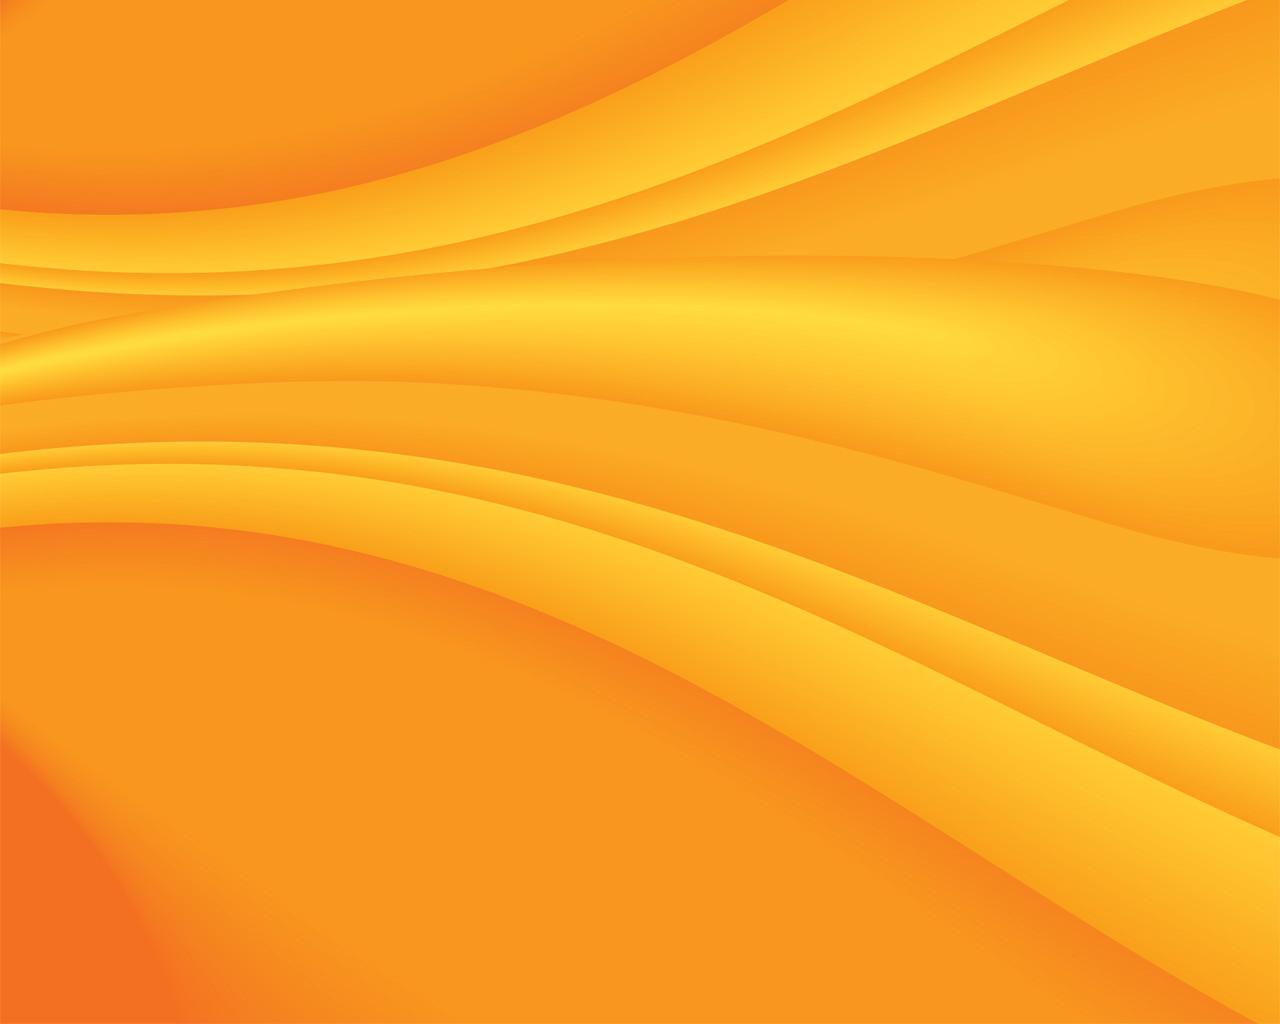 orangeybig